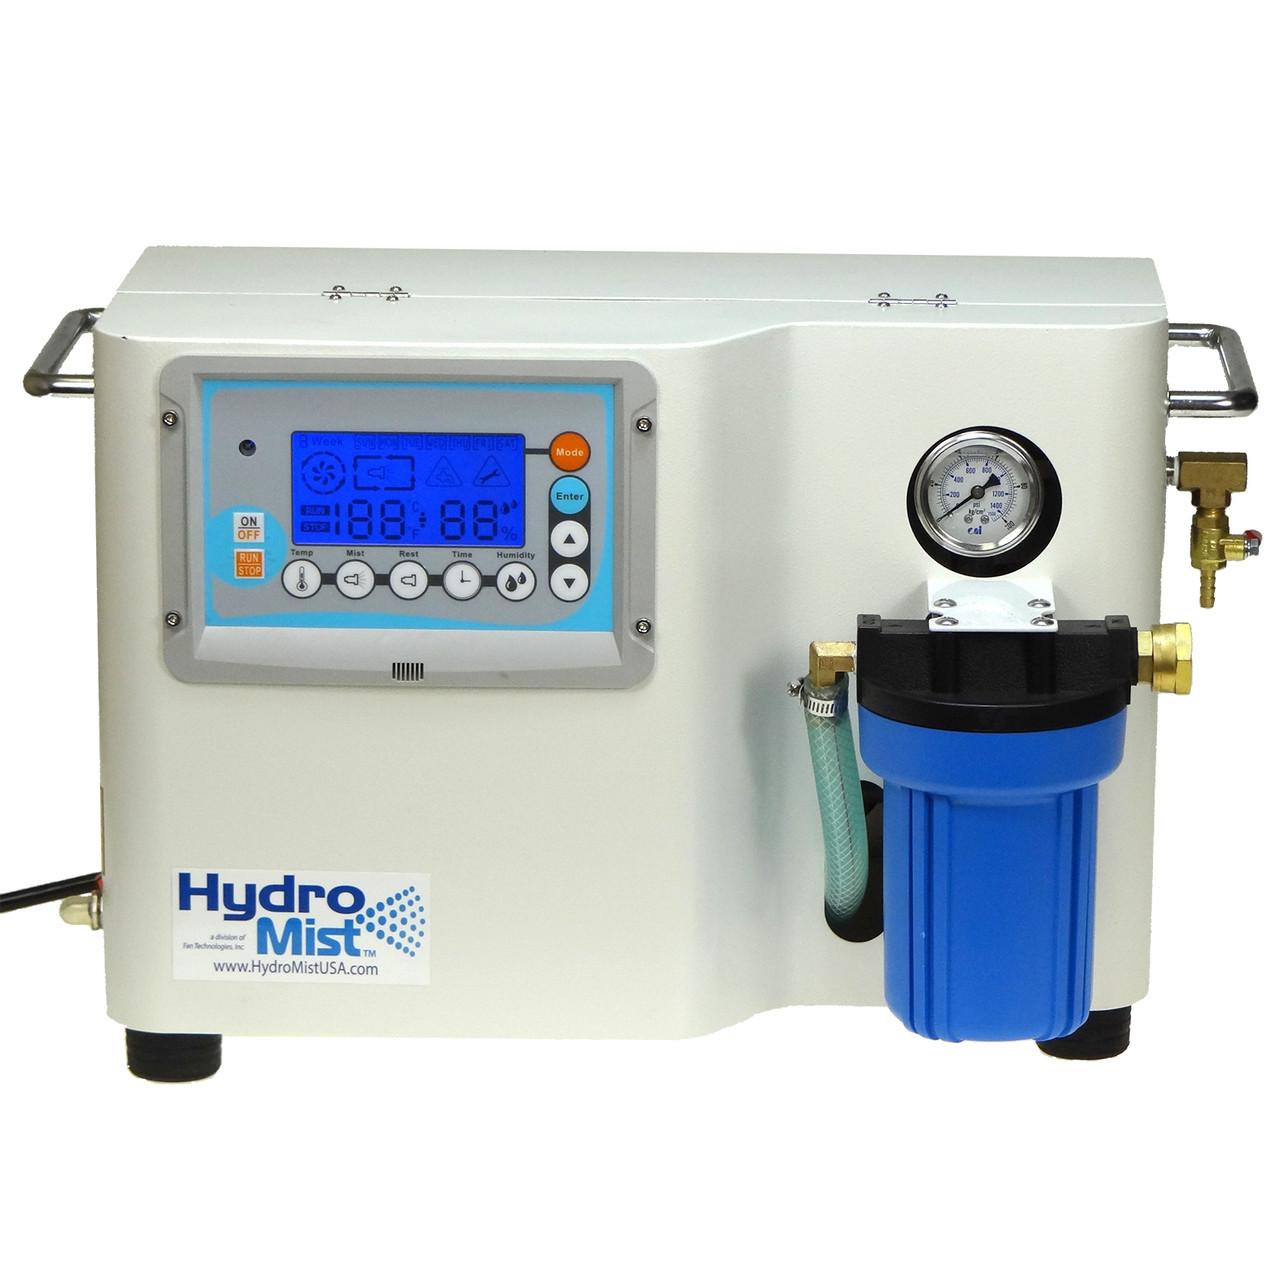 ProMist 100 High Pressure Misting Pump (64 Nozzles)-1000 PSI- 1HP